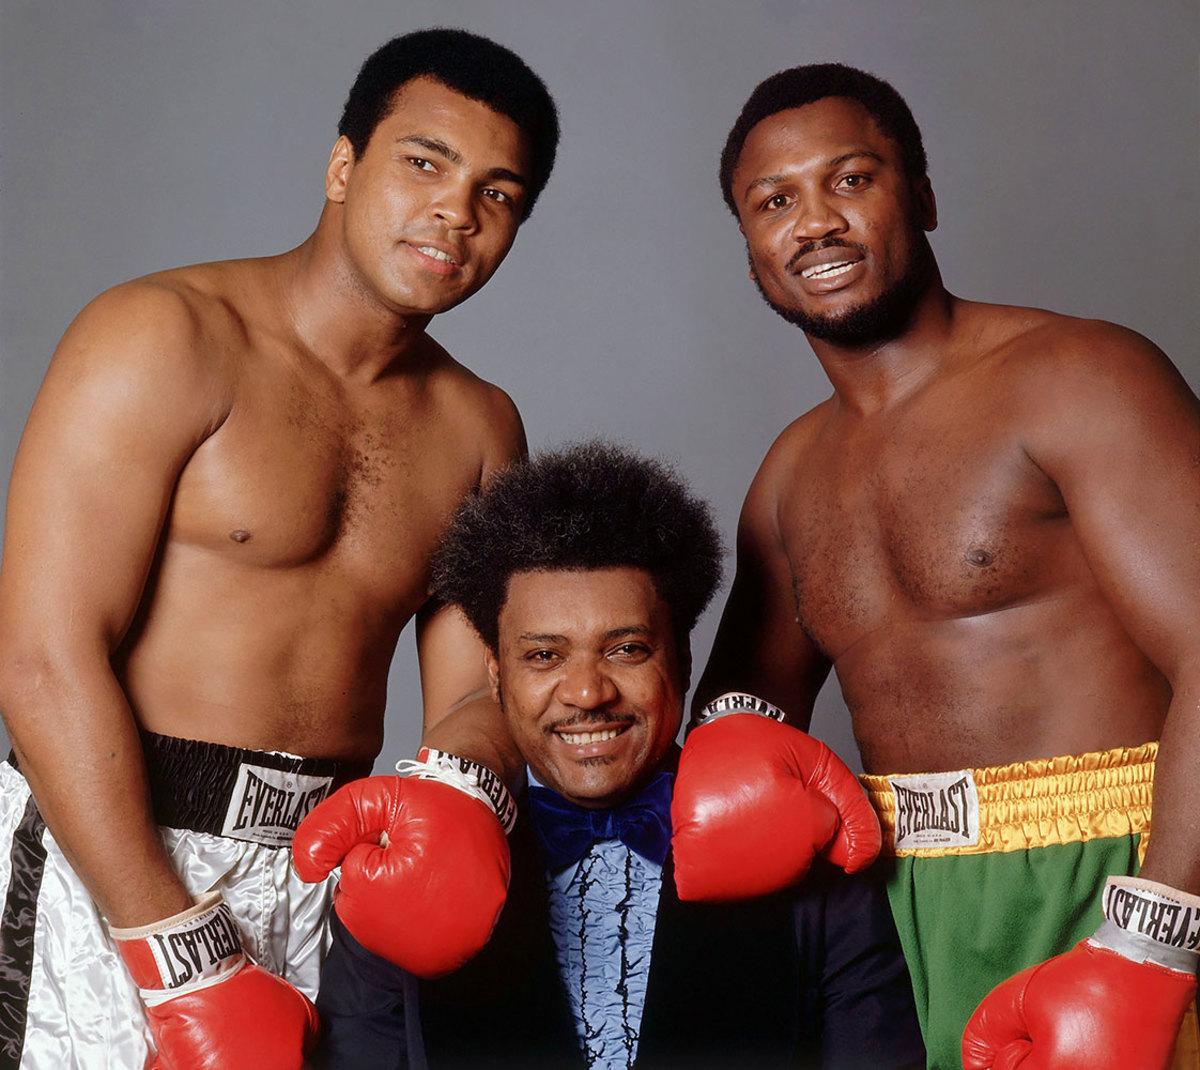 1975-0825-SI-cover-Don-King-Muhammad-Ali-Joe-Frazier-001351874.jpg